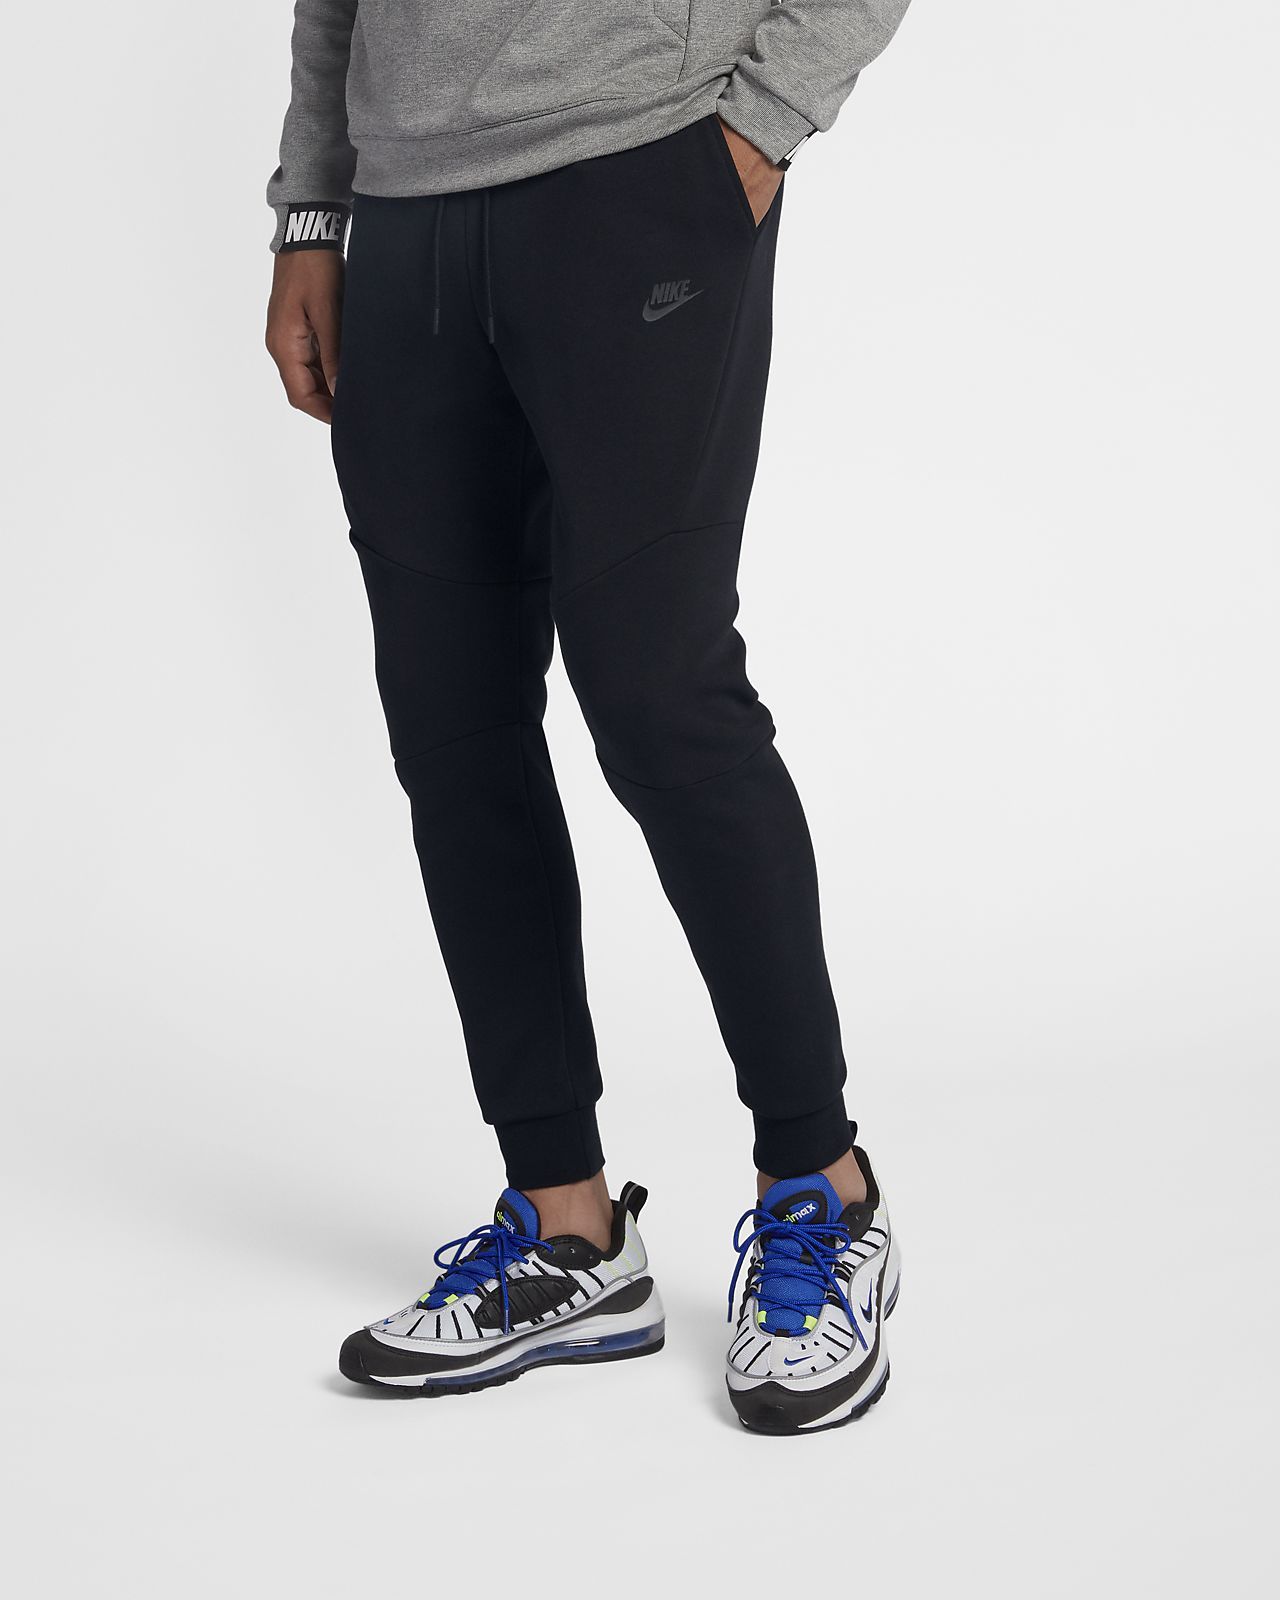 Sequoia, Sequoia, černá, černá Nike Tech Camo Fleece Mikina